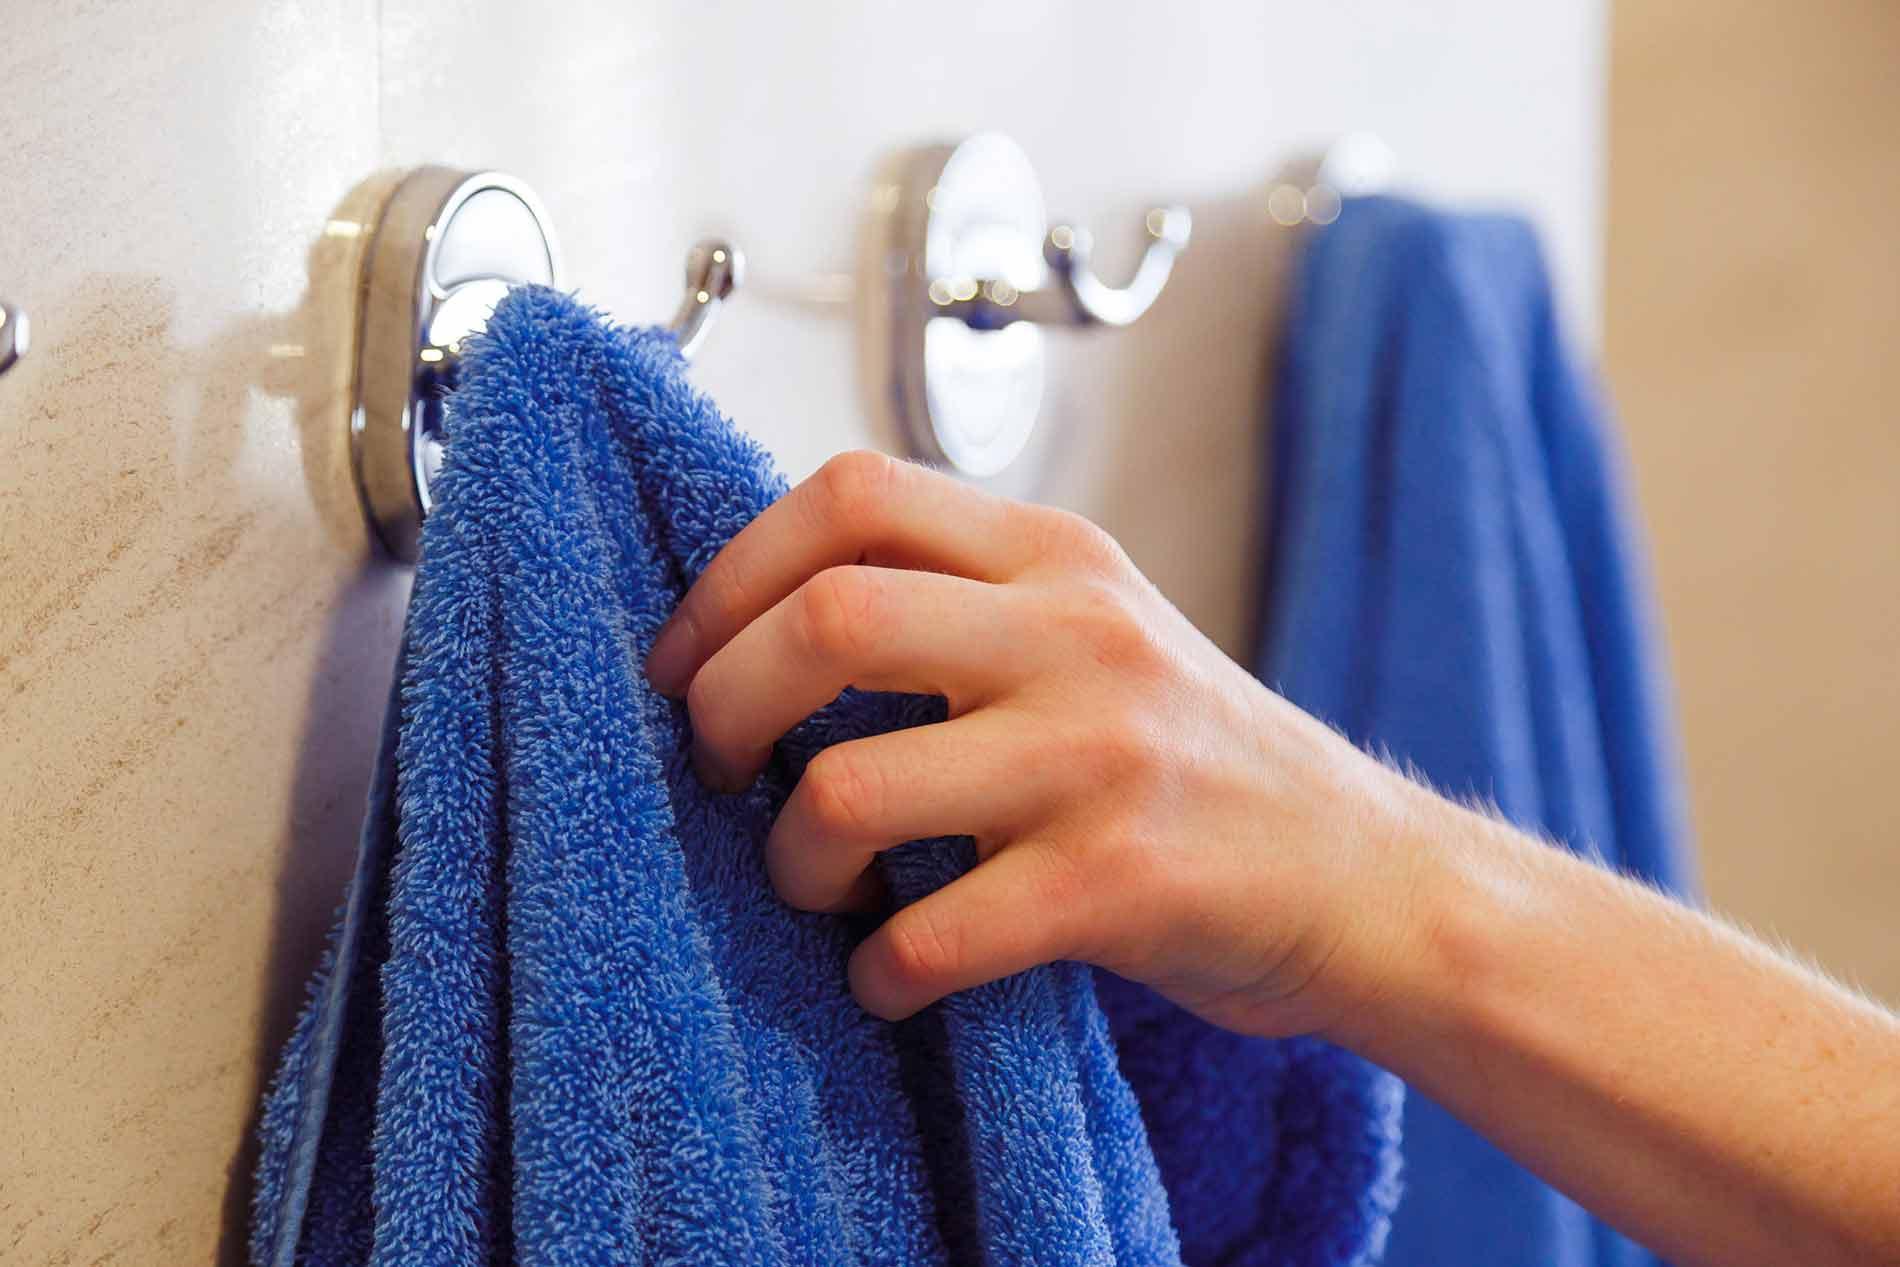 A woman grabbing a towel after using an infrared sauna